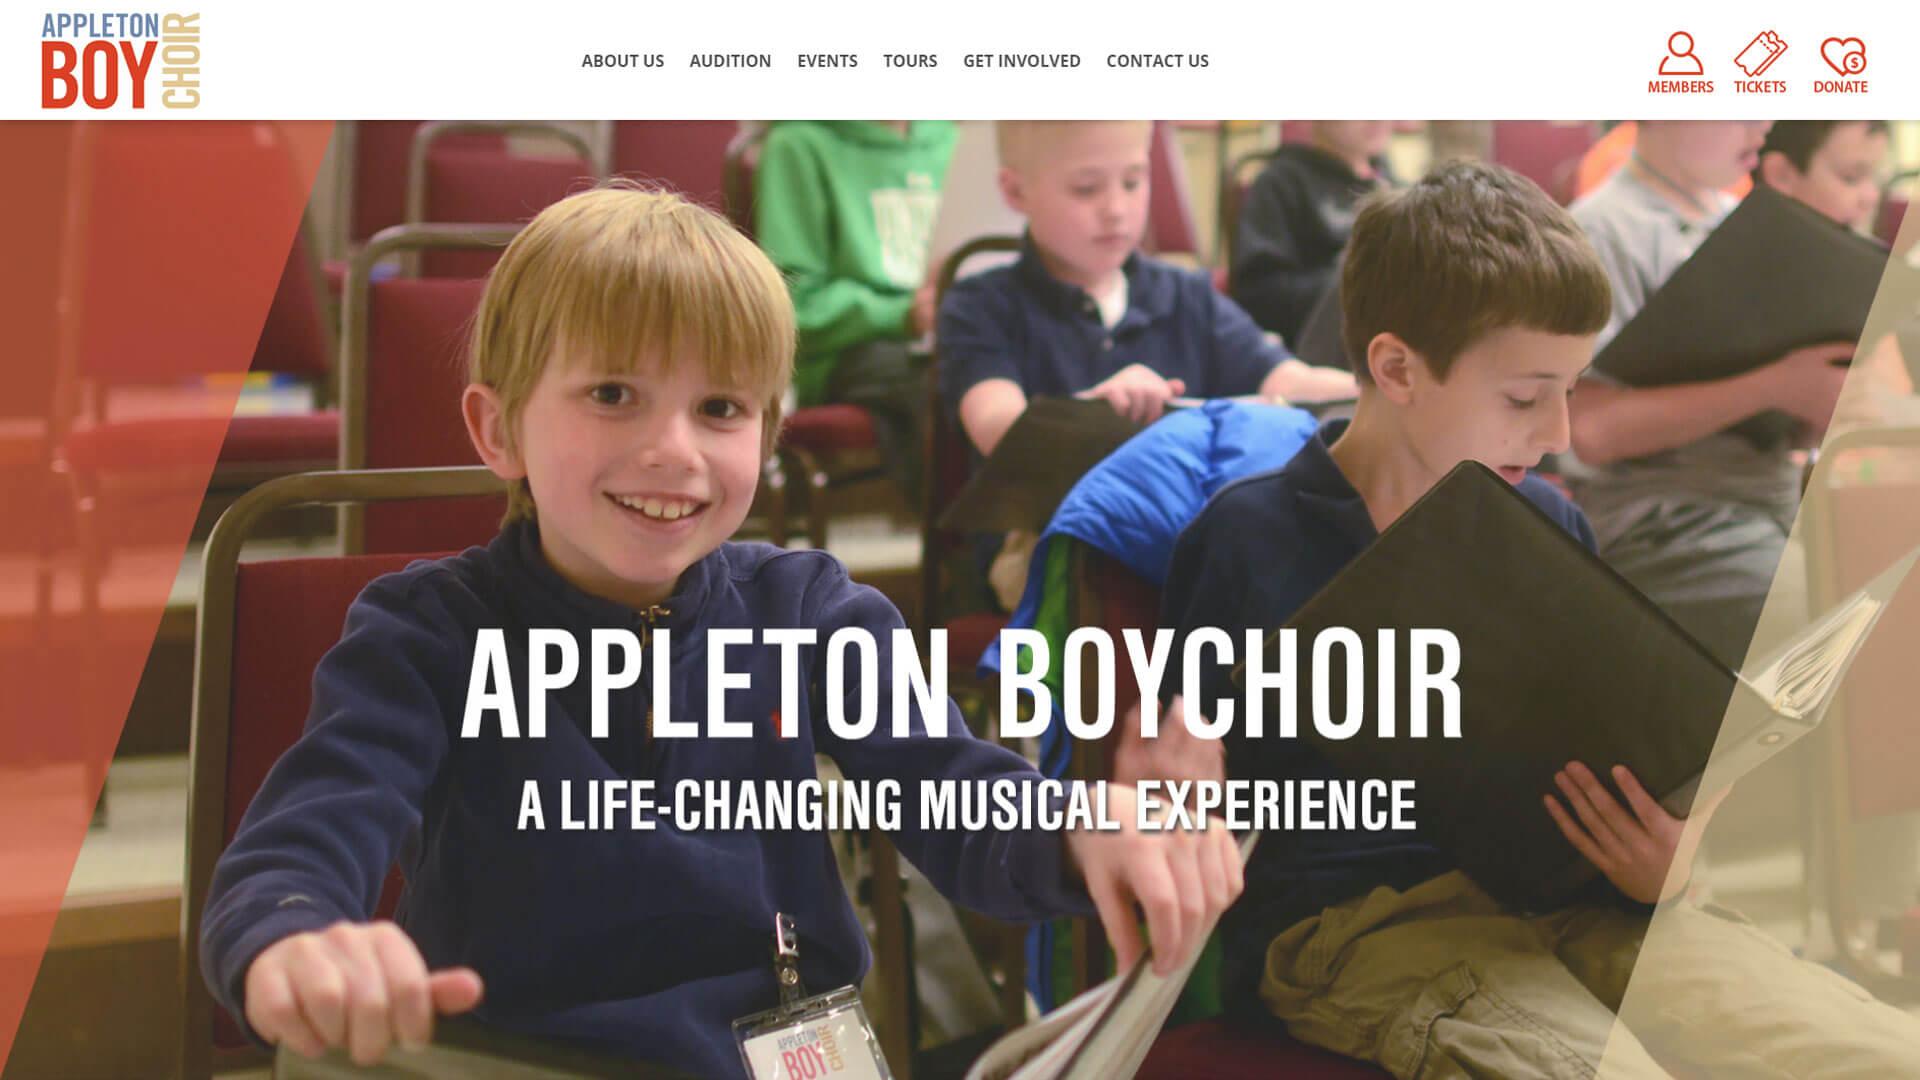 appleton-boychoir